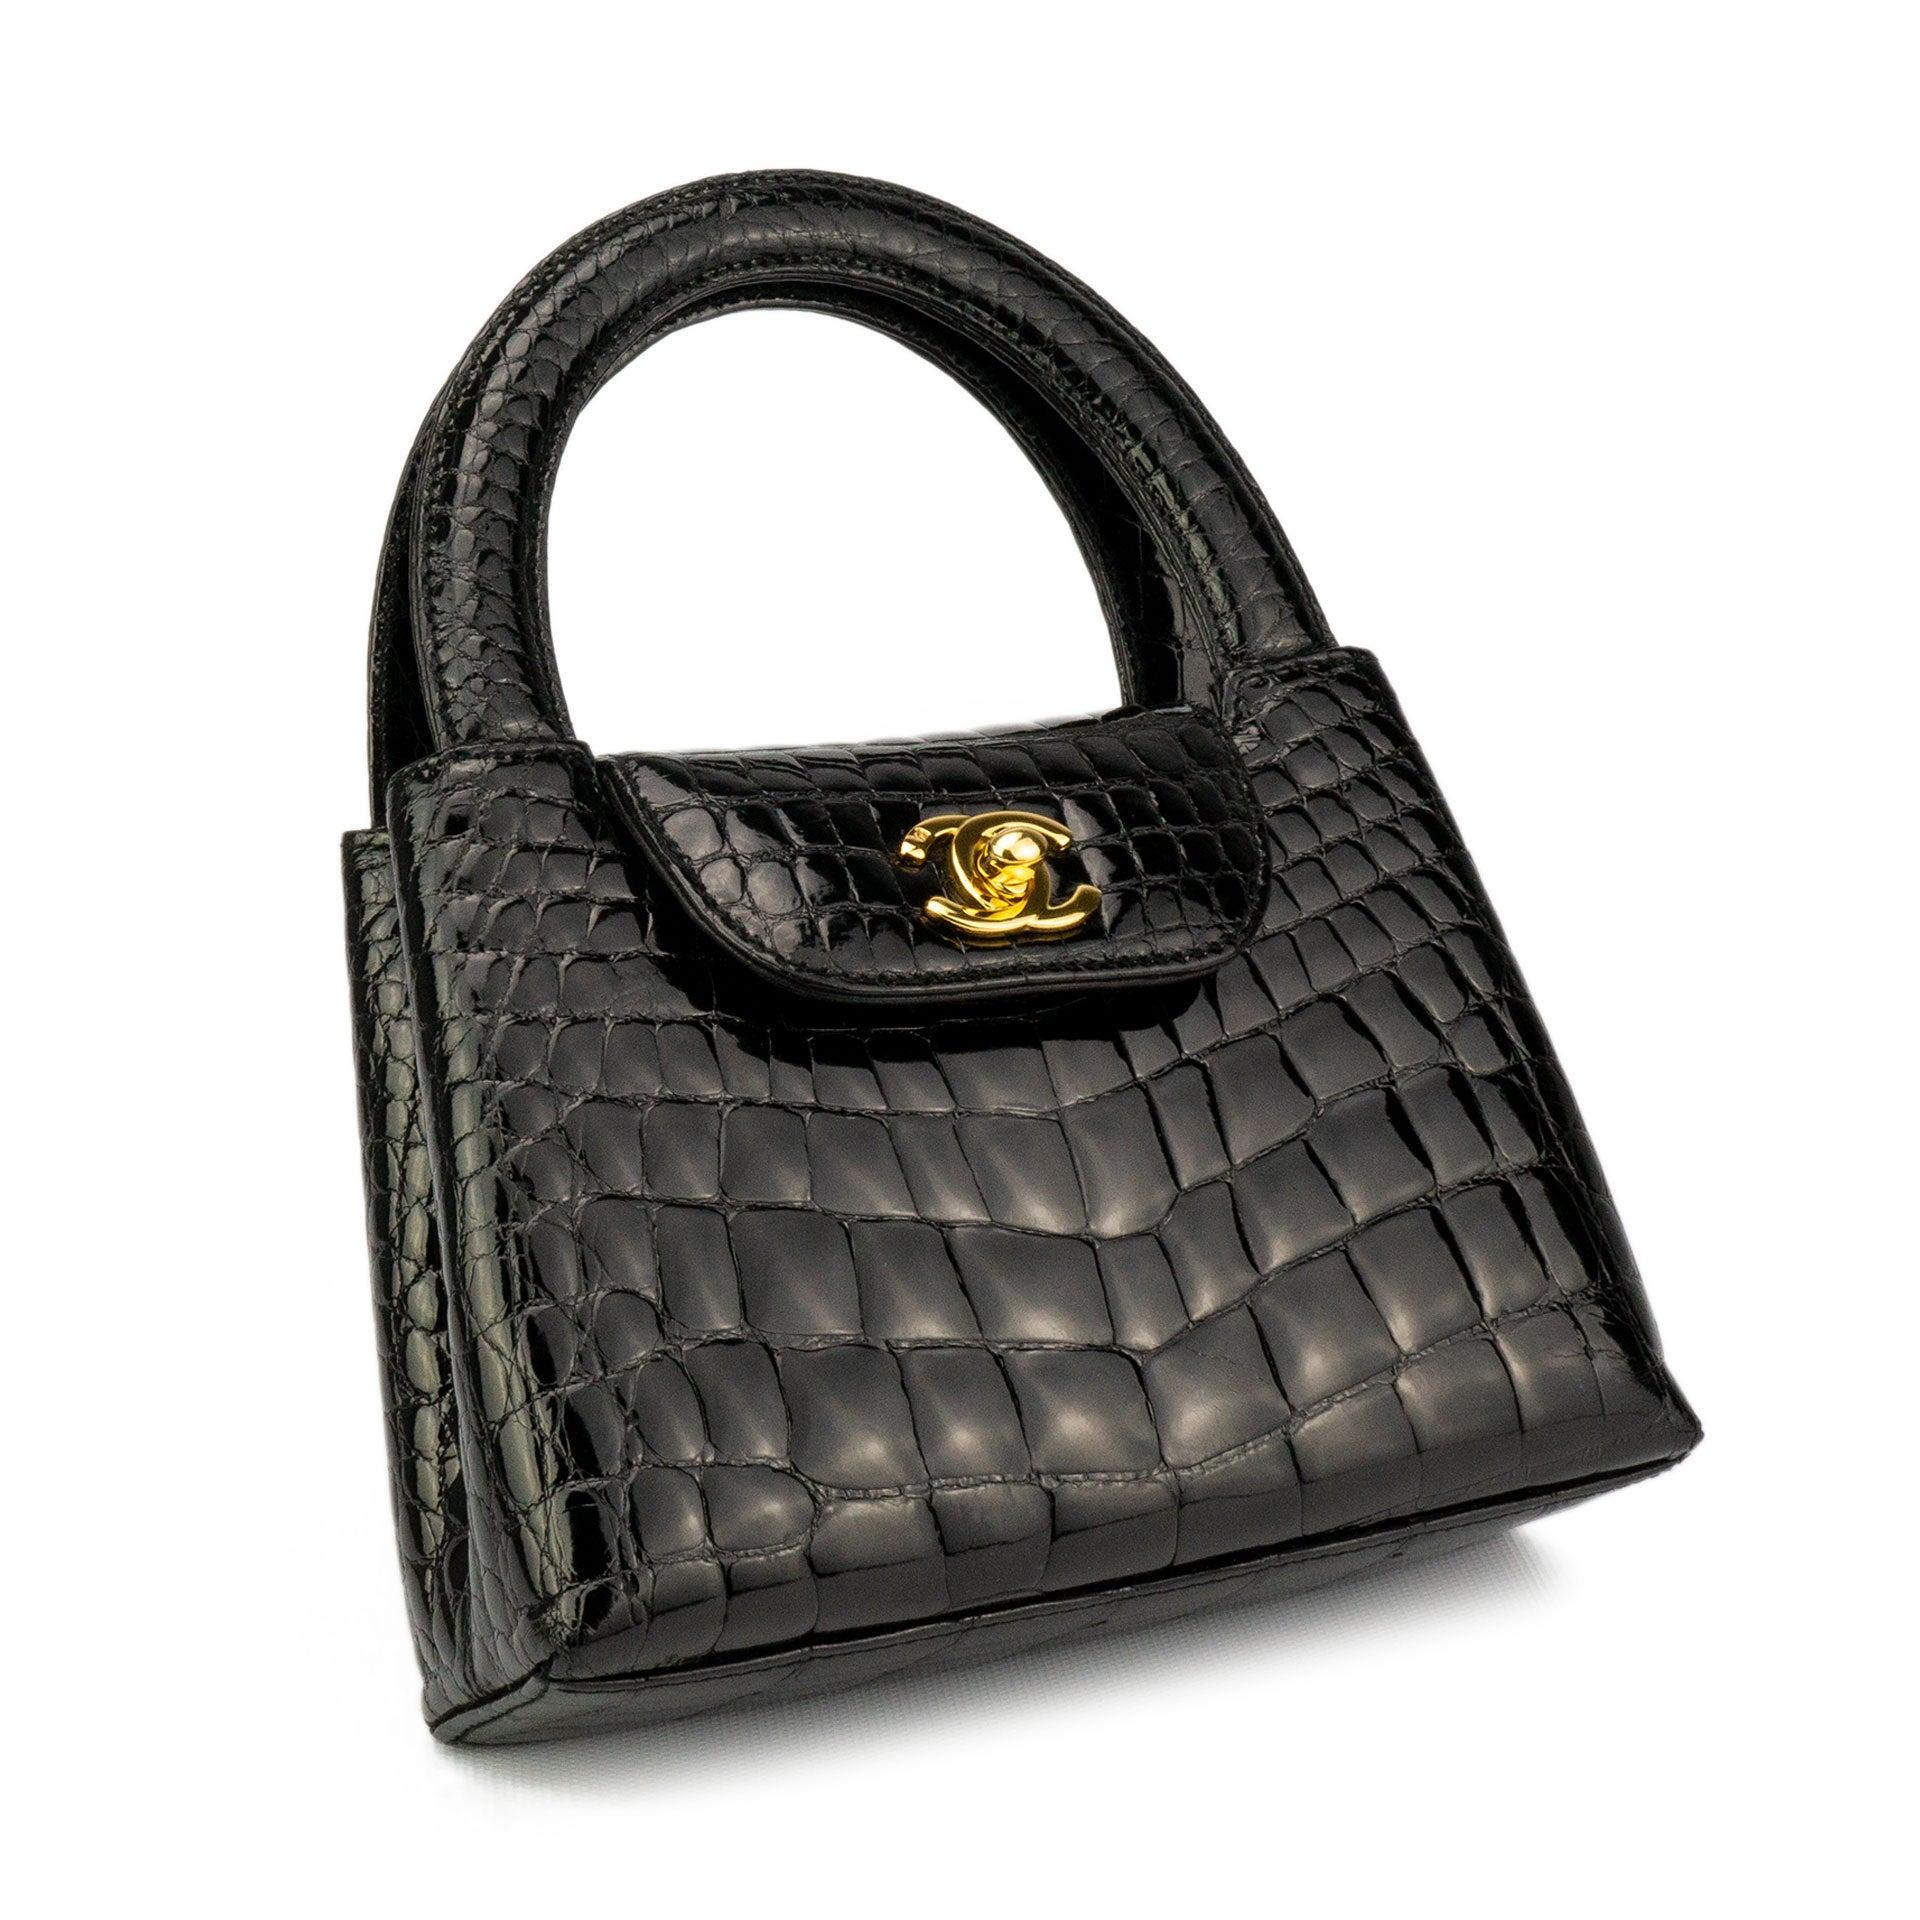 ff100685e99e Chanel Black Crocodile Vintage Mini Teeny Tiny Kelly Clutch Alligator Tote  Bag at 1stdibs